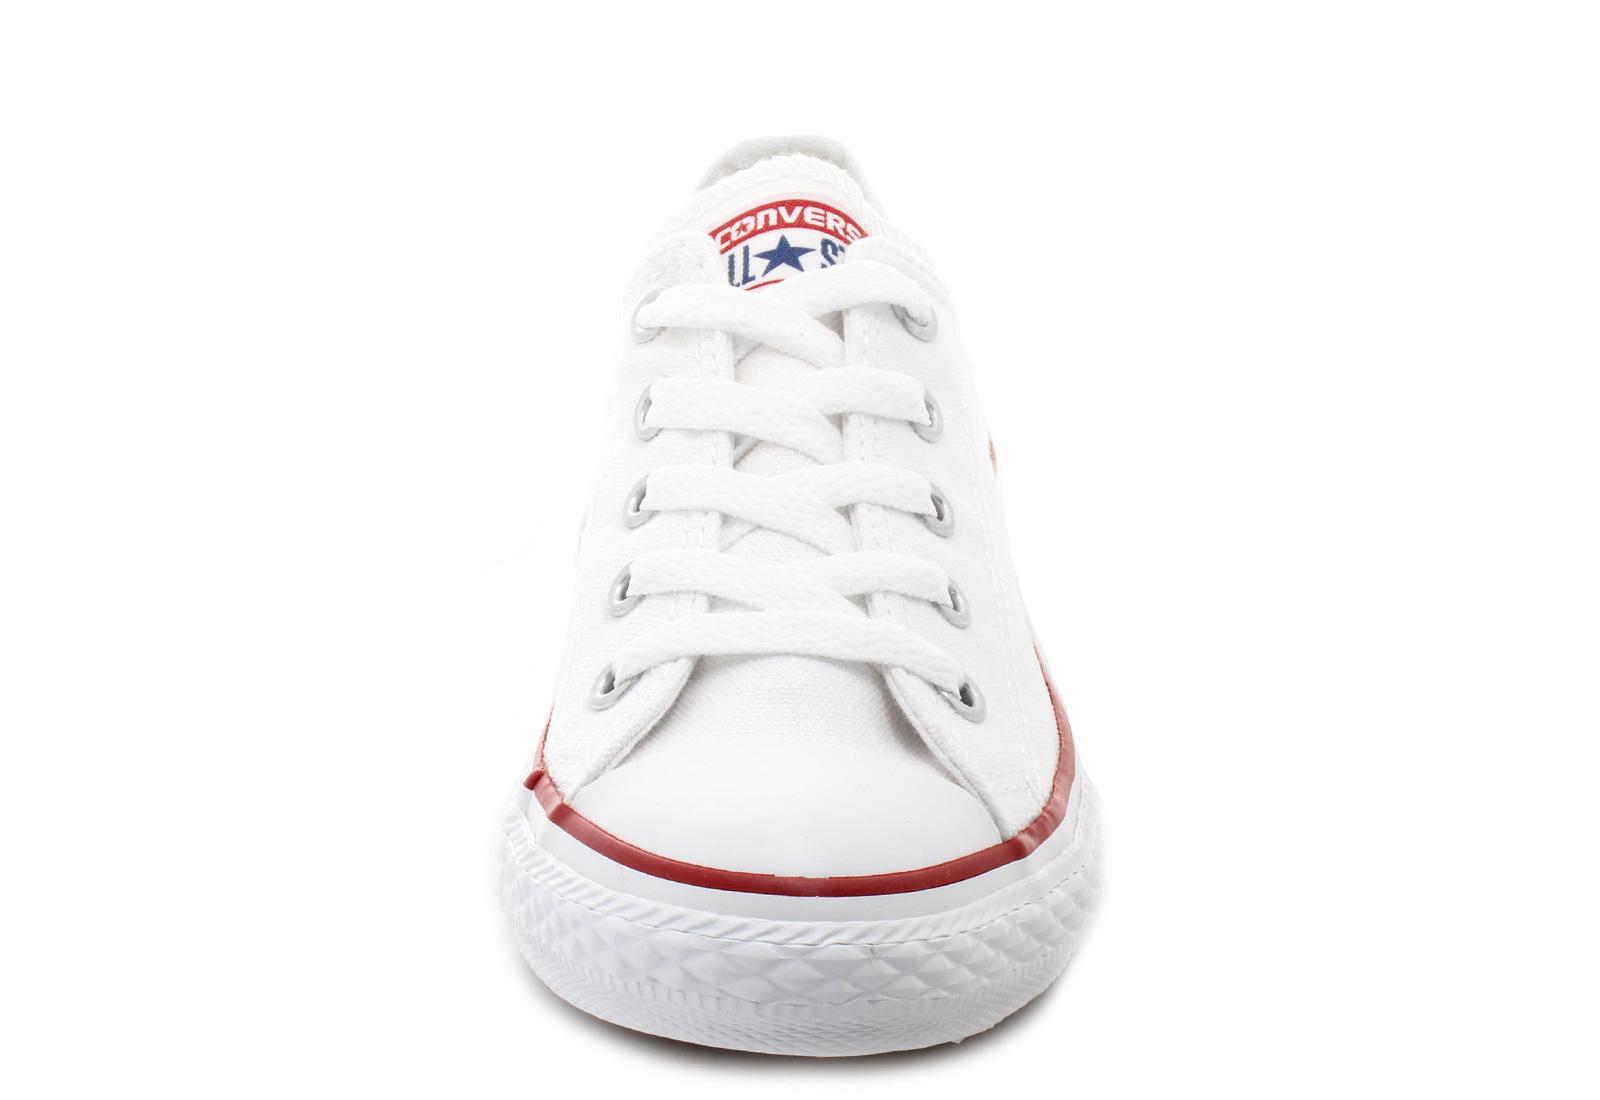 Converse Tornacipő - Ct As Kids Core Ox - 3J256C - Office Shoes ... 9f12238a1a